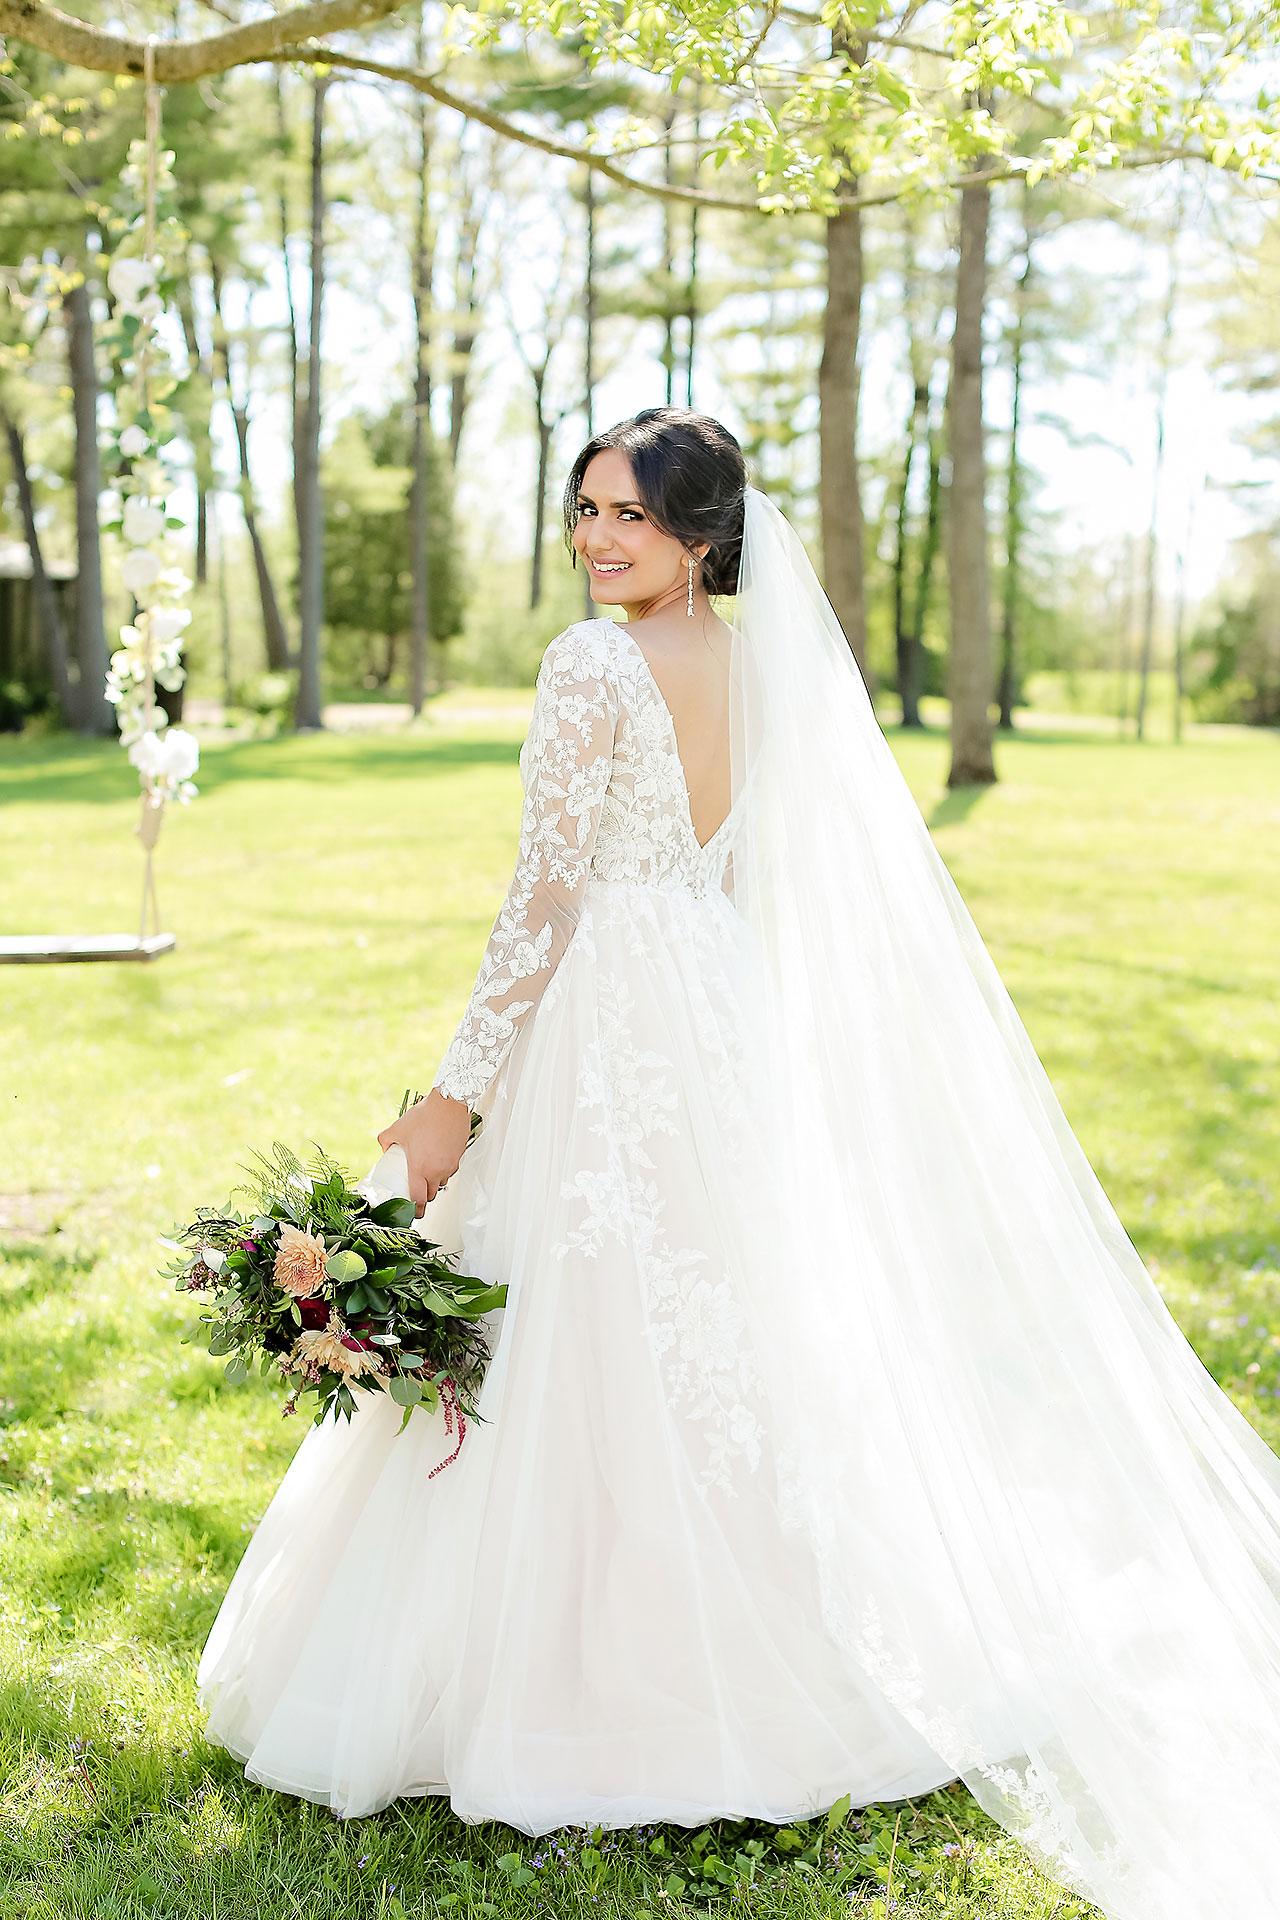 Nadia Parker Black Iris Estate Carmel Indiana Wedding May 2021 100